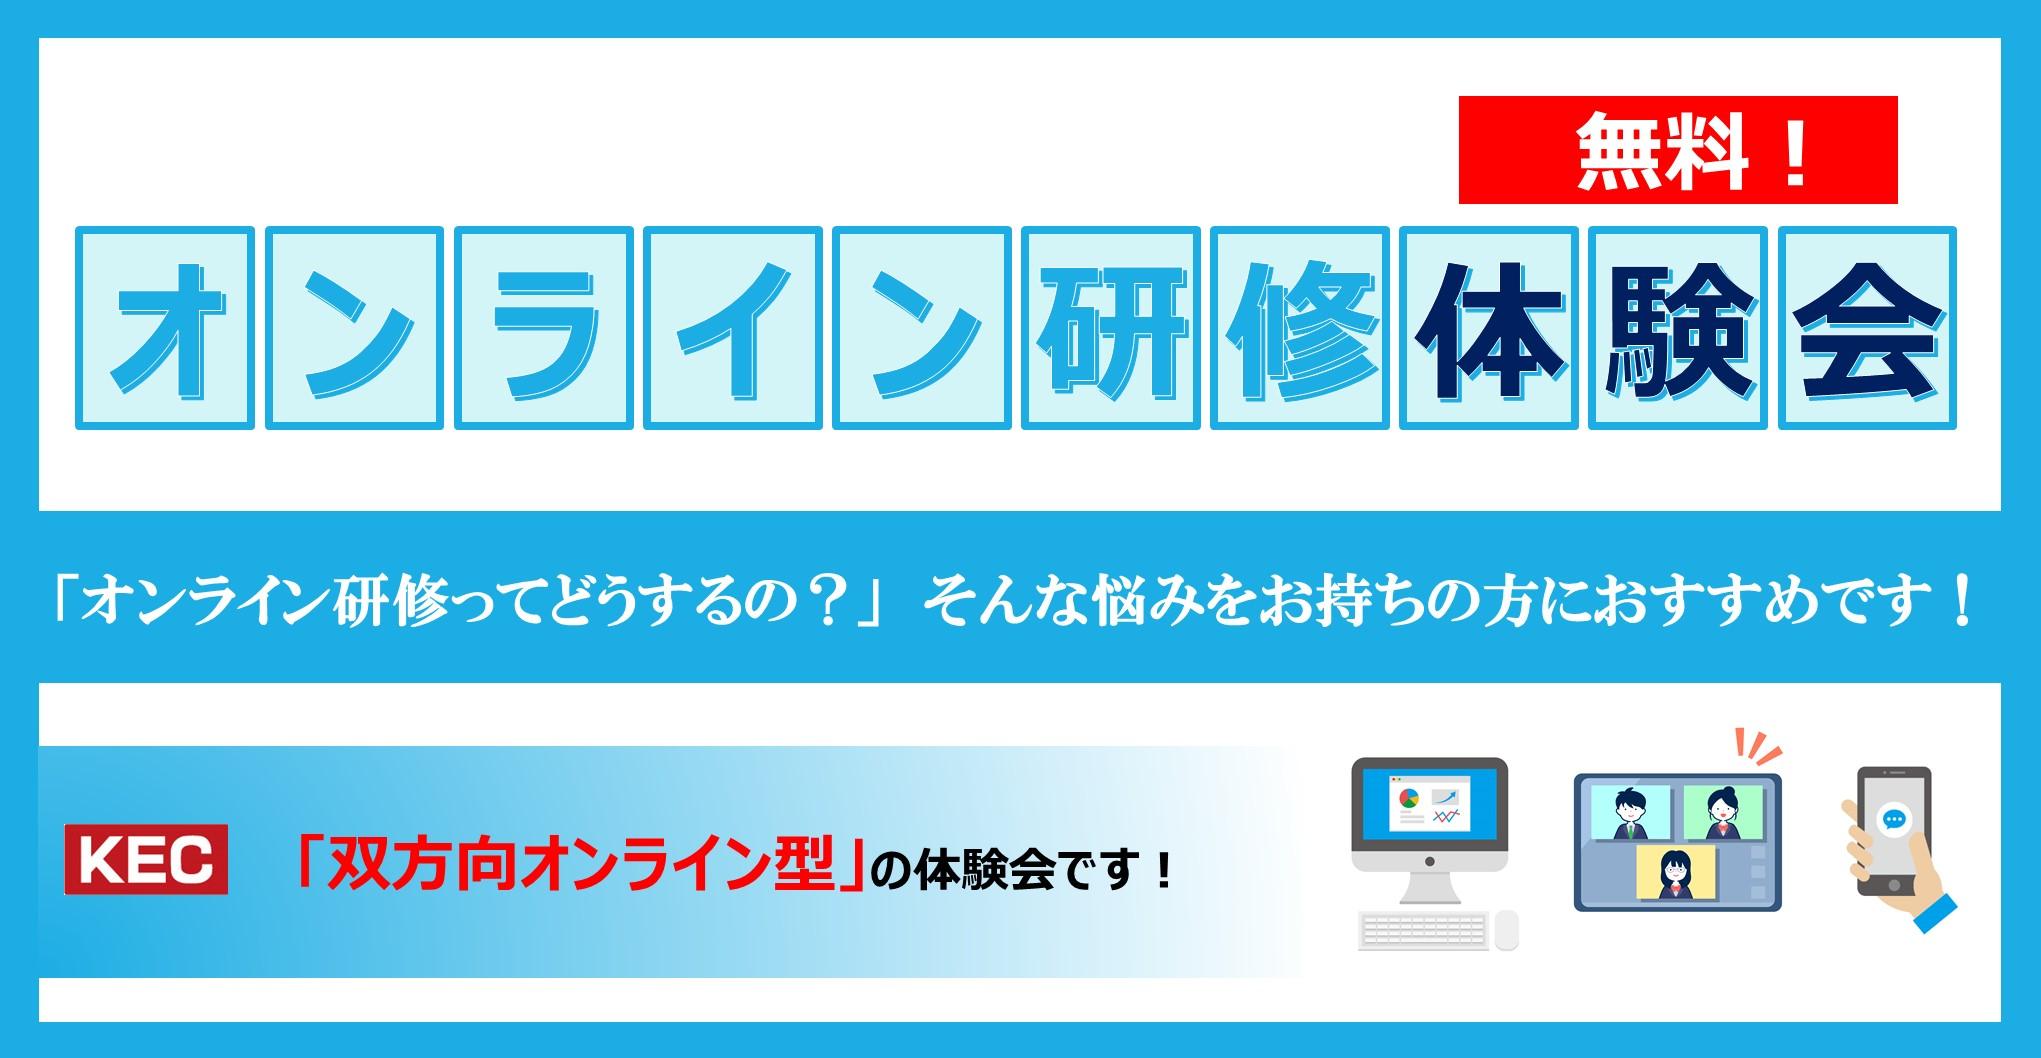 https://www.consul.kec.ne.jp/wp/wp-content/uploads/2020/05/540-280-online-consultation.jpg